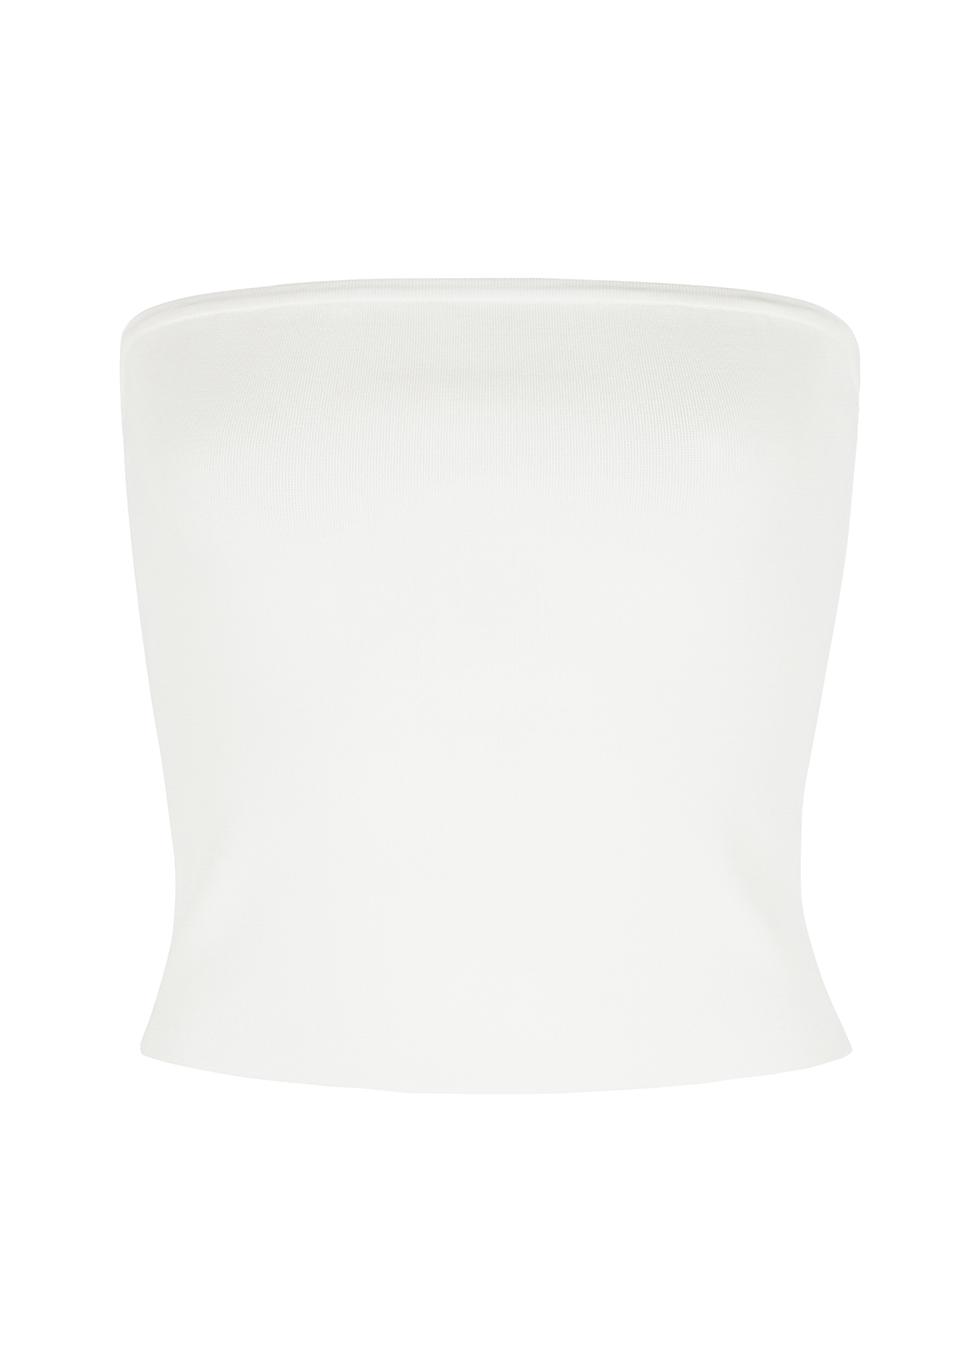 Alison white stretch-knit top